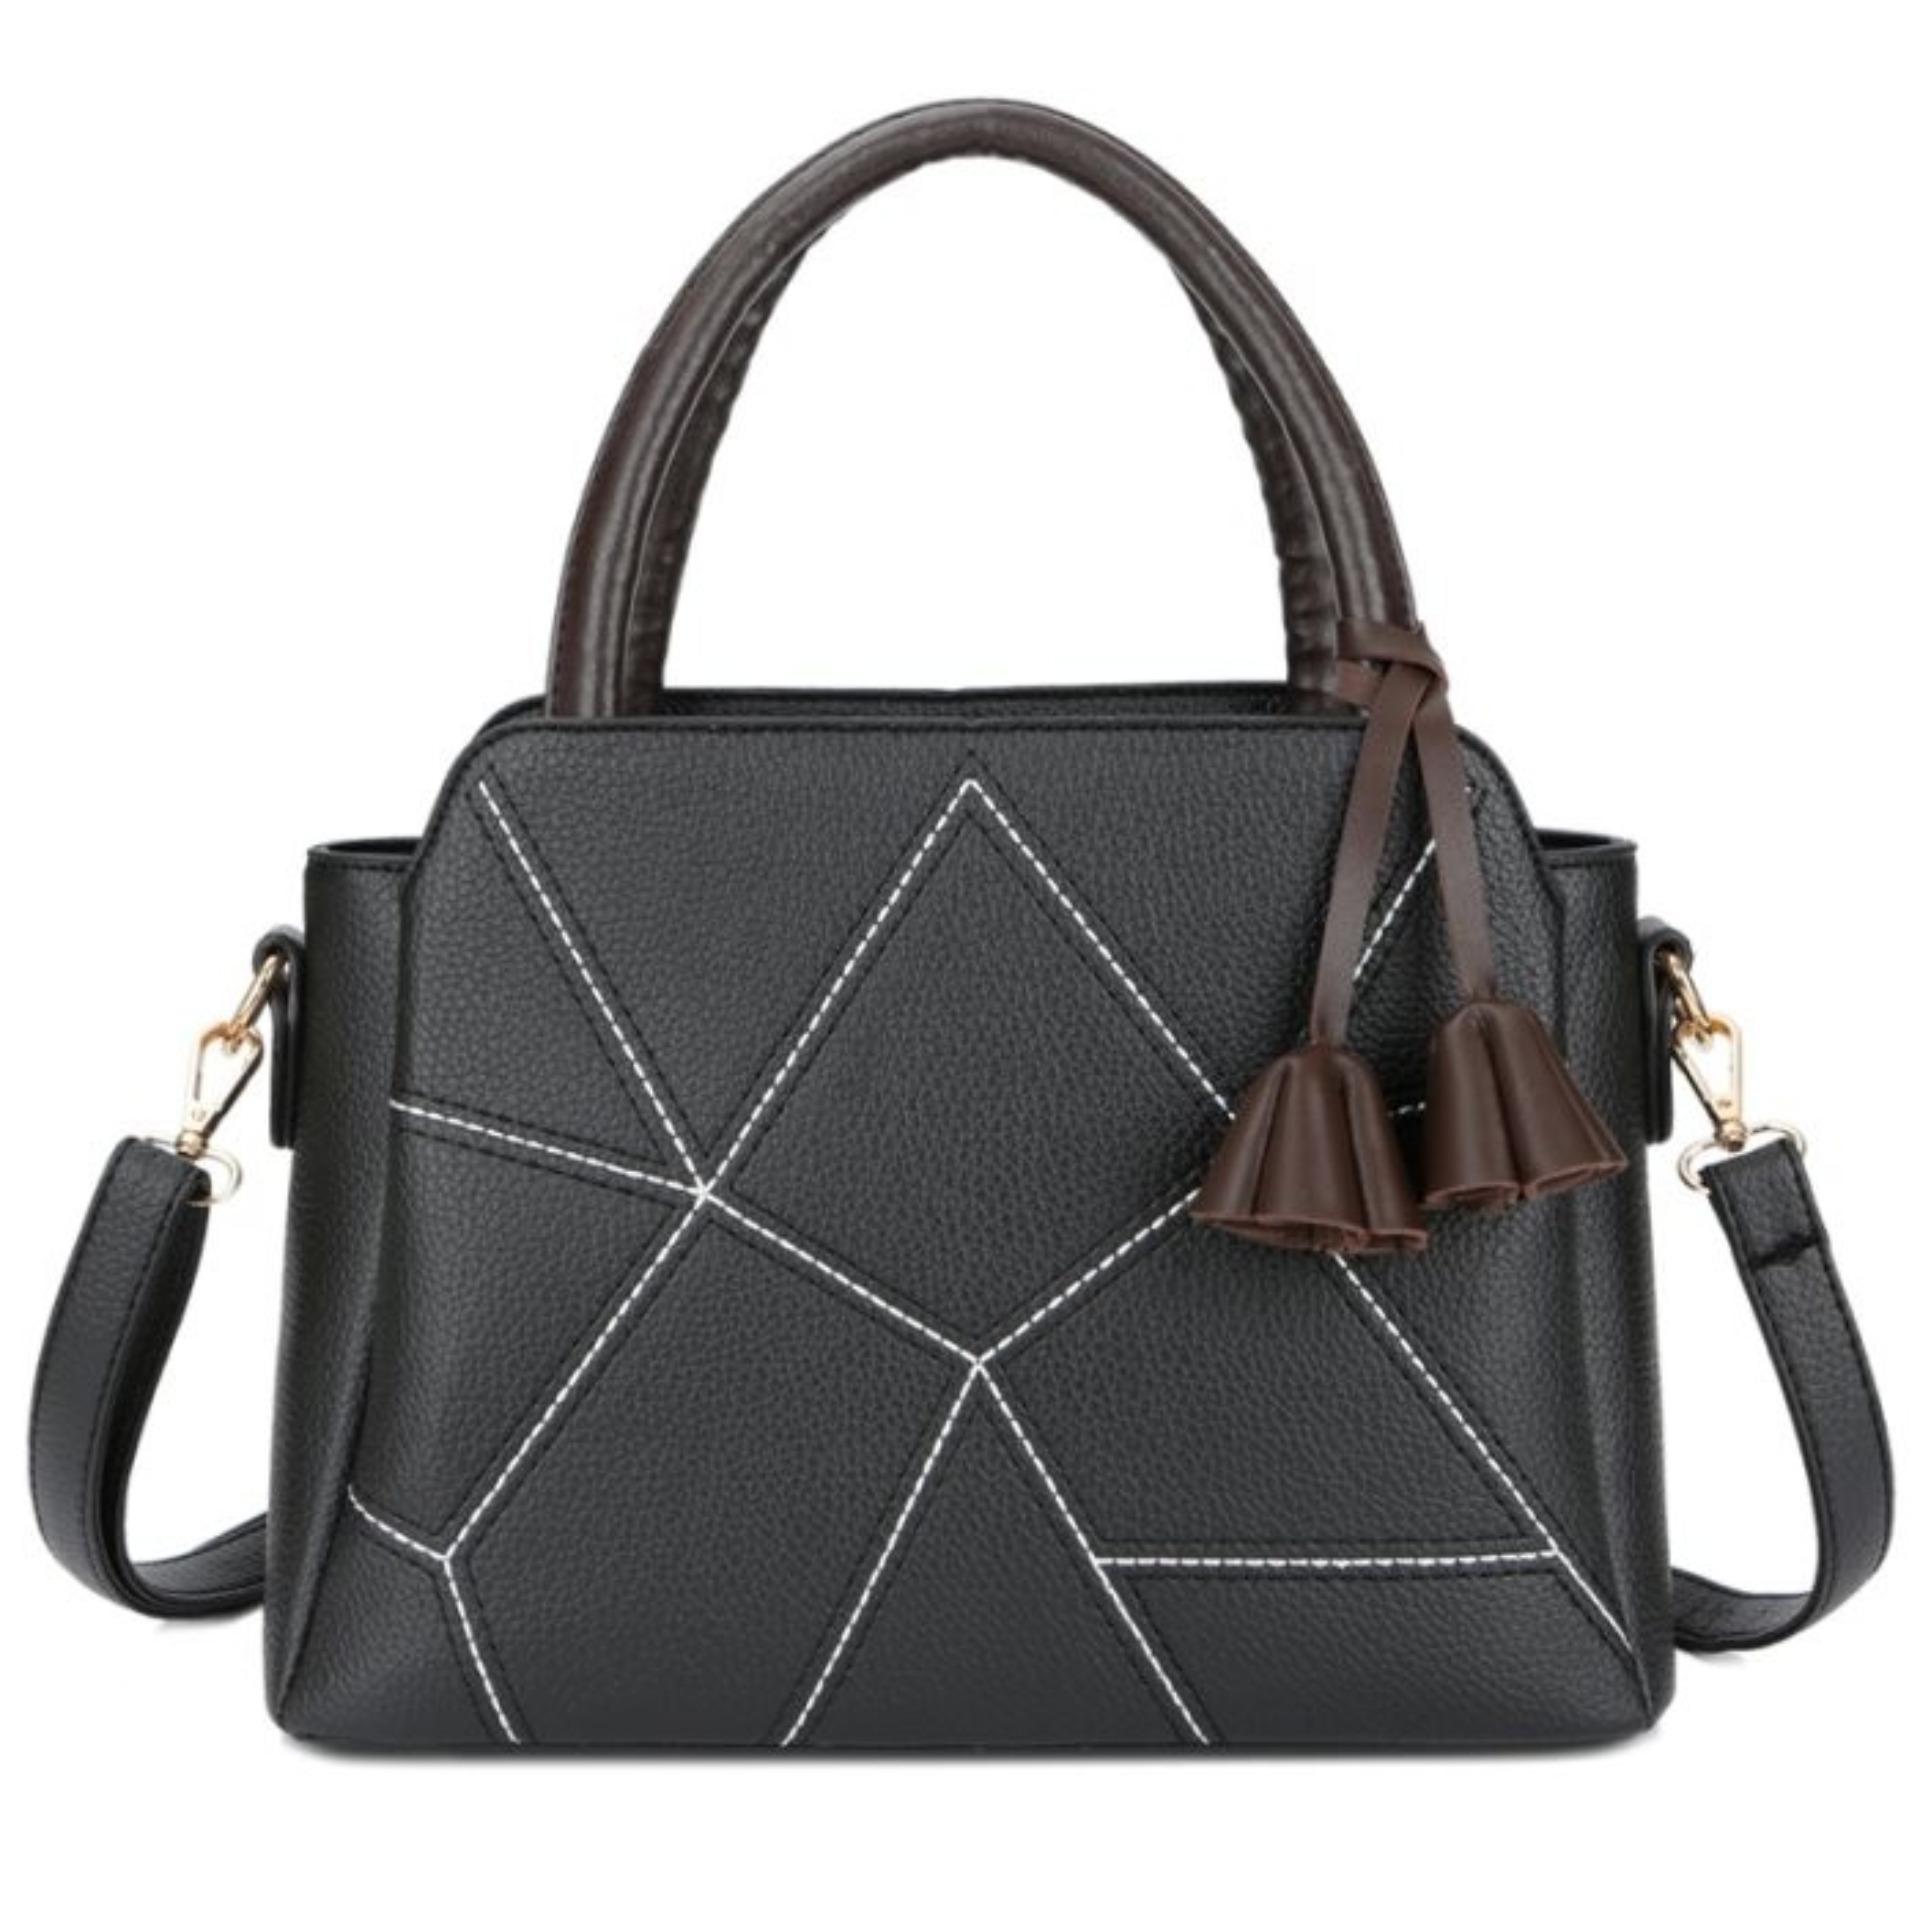 Stylish   Trendy KGS Tas Wanita Selempang Casual Cracked Tassel Handbag -  Hitam b875117699